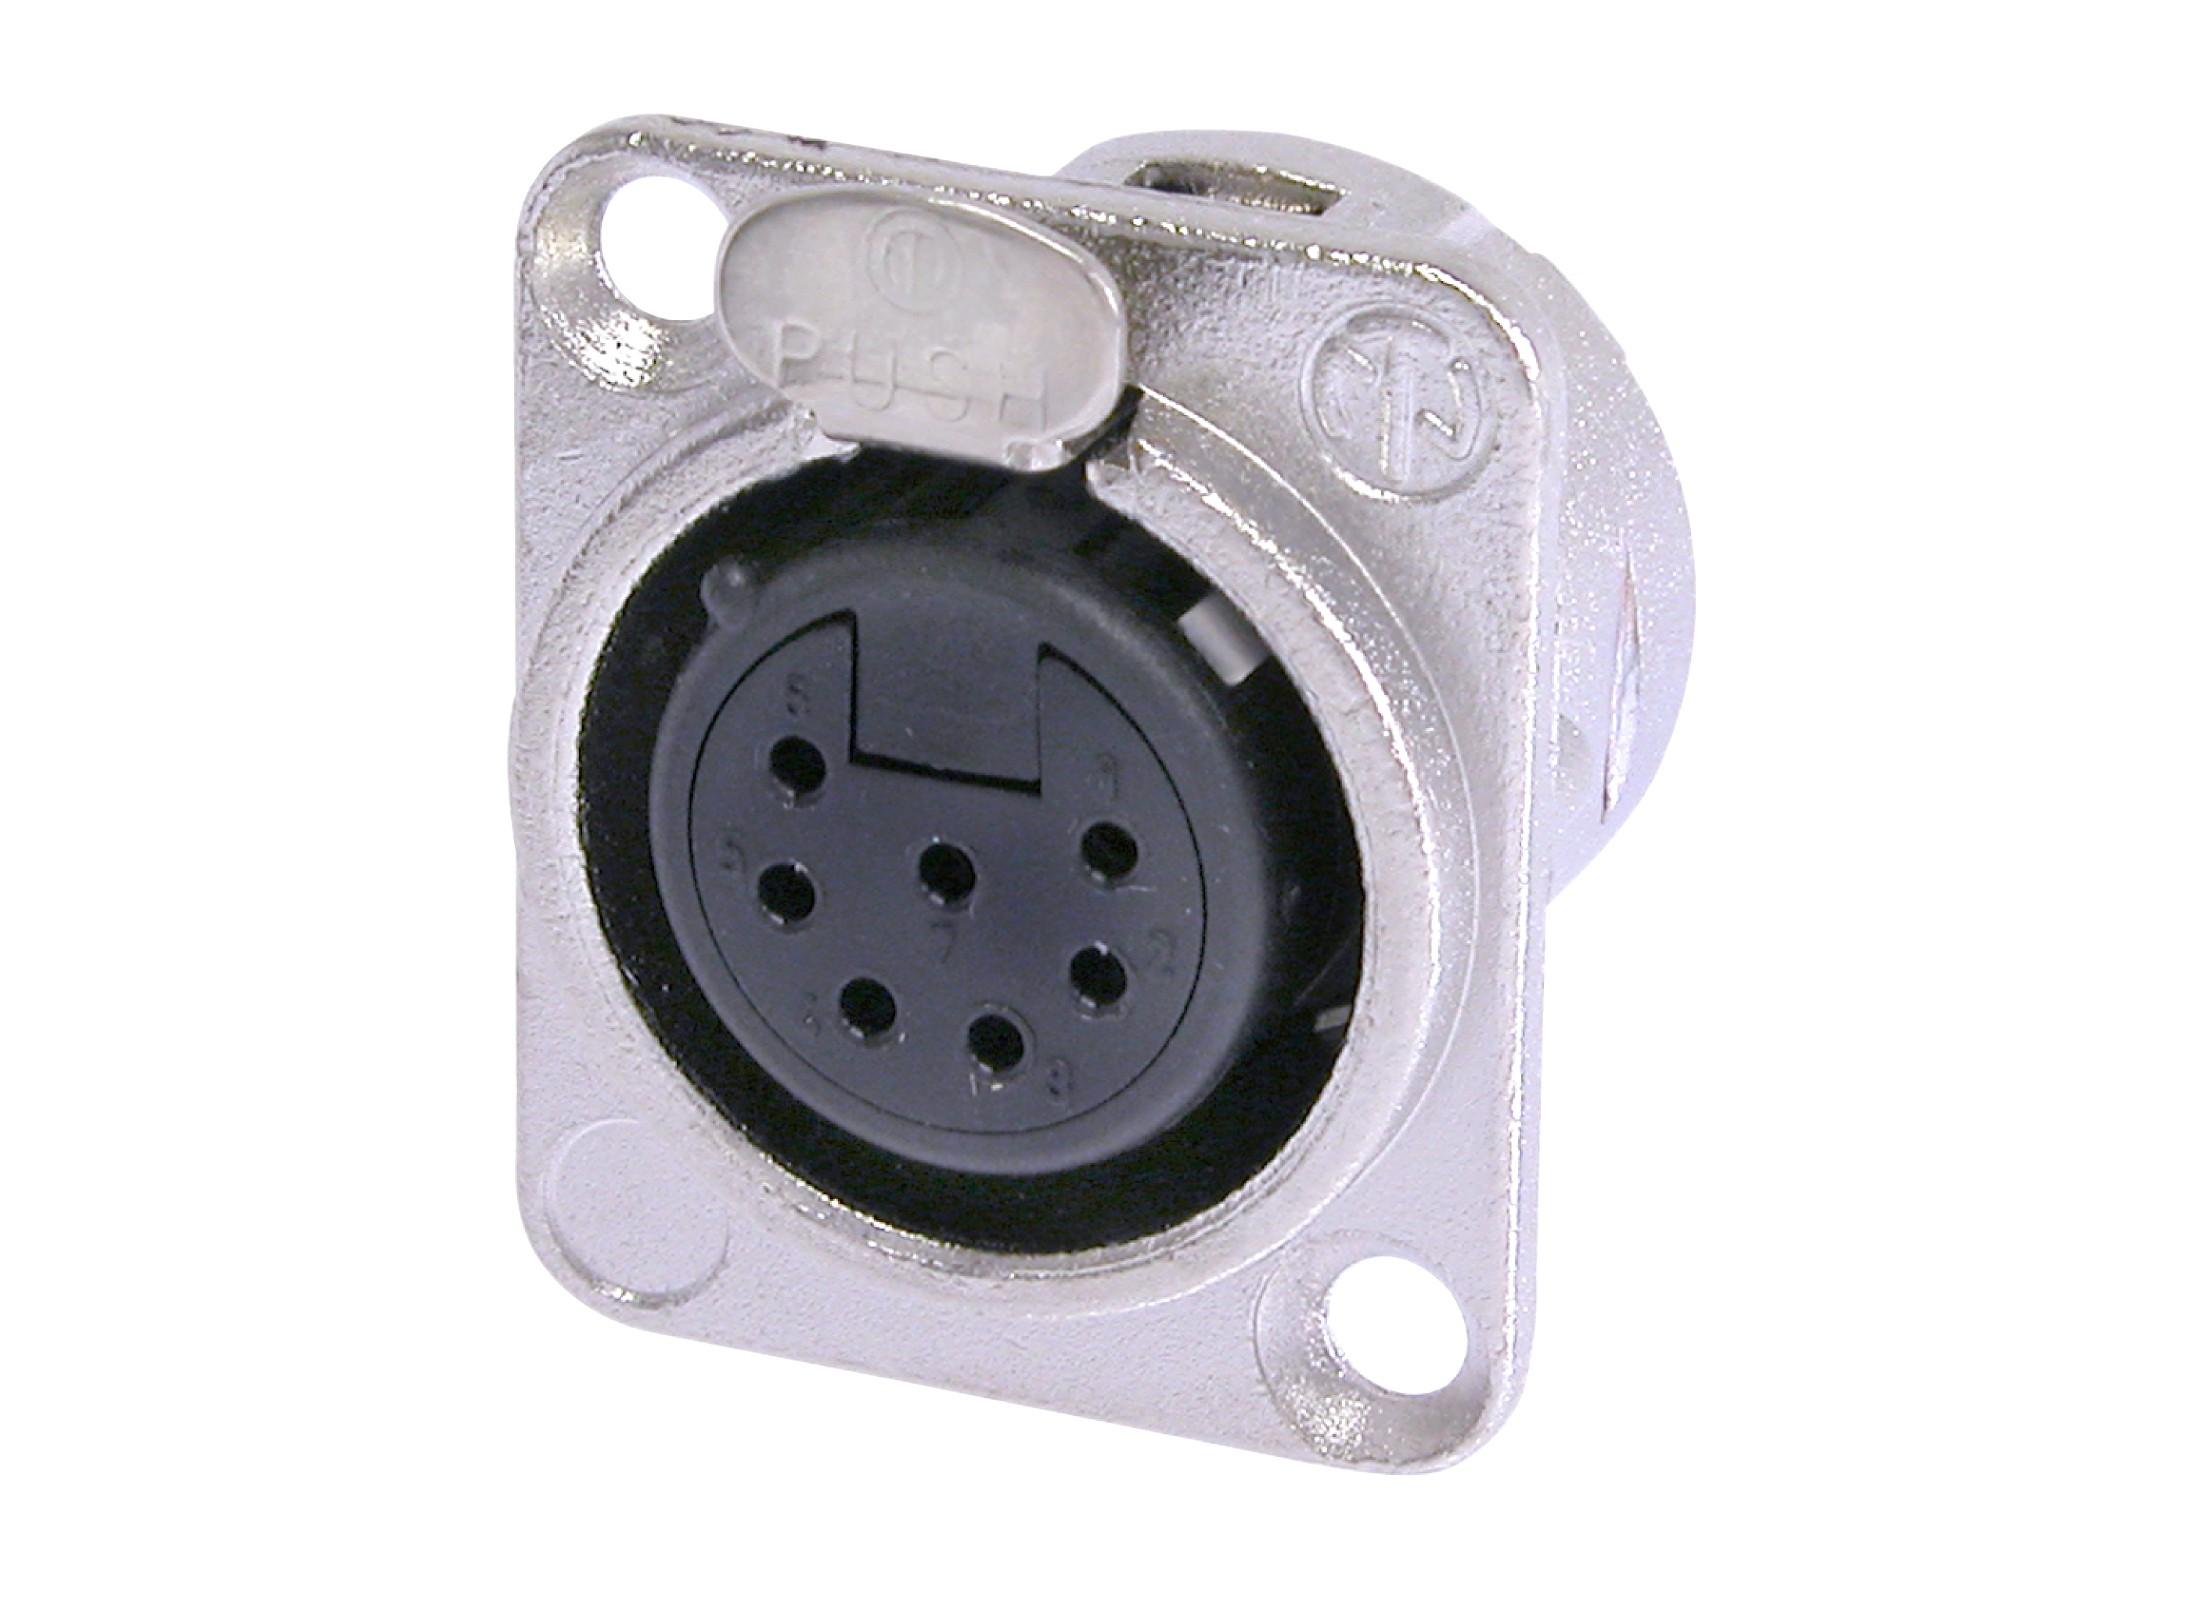 Black XLR Female Connector 3 Pole Neutrik NC3FXX-BAG Silver Plated Contacts